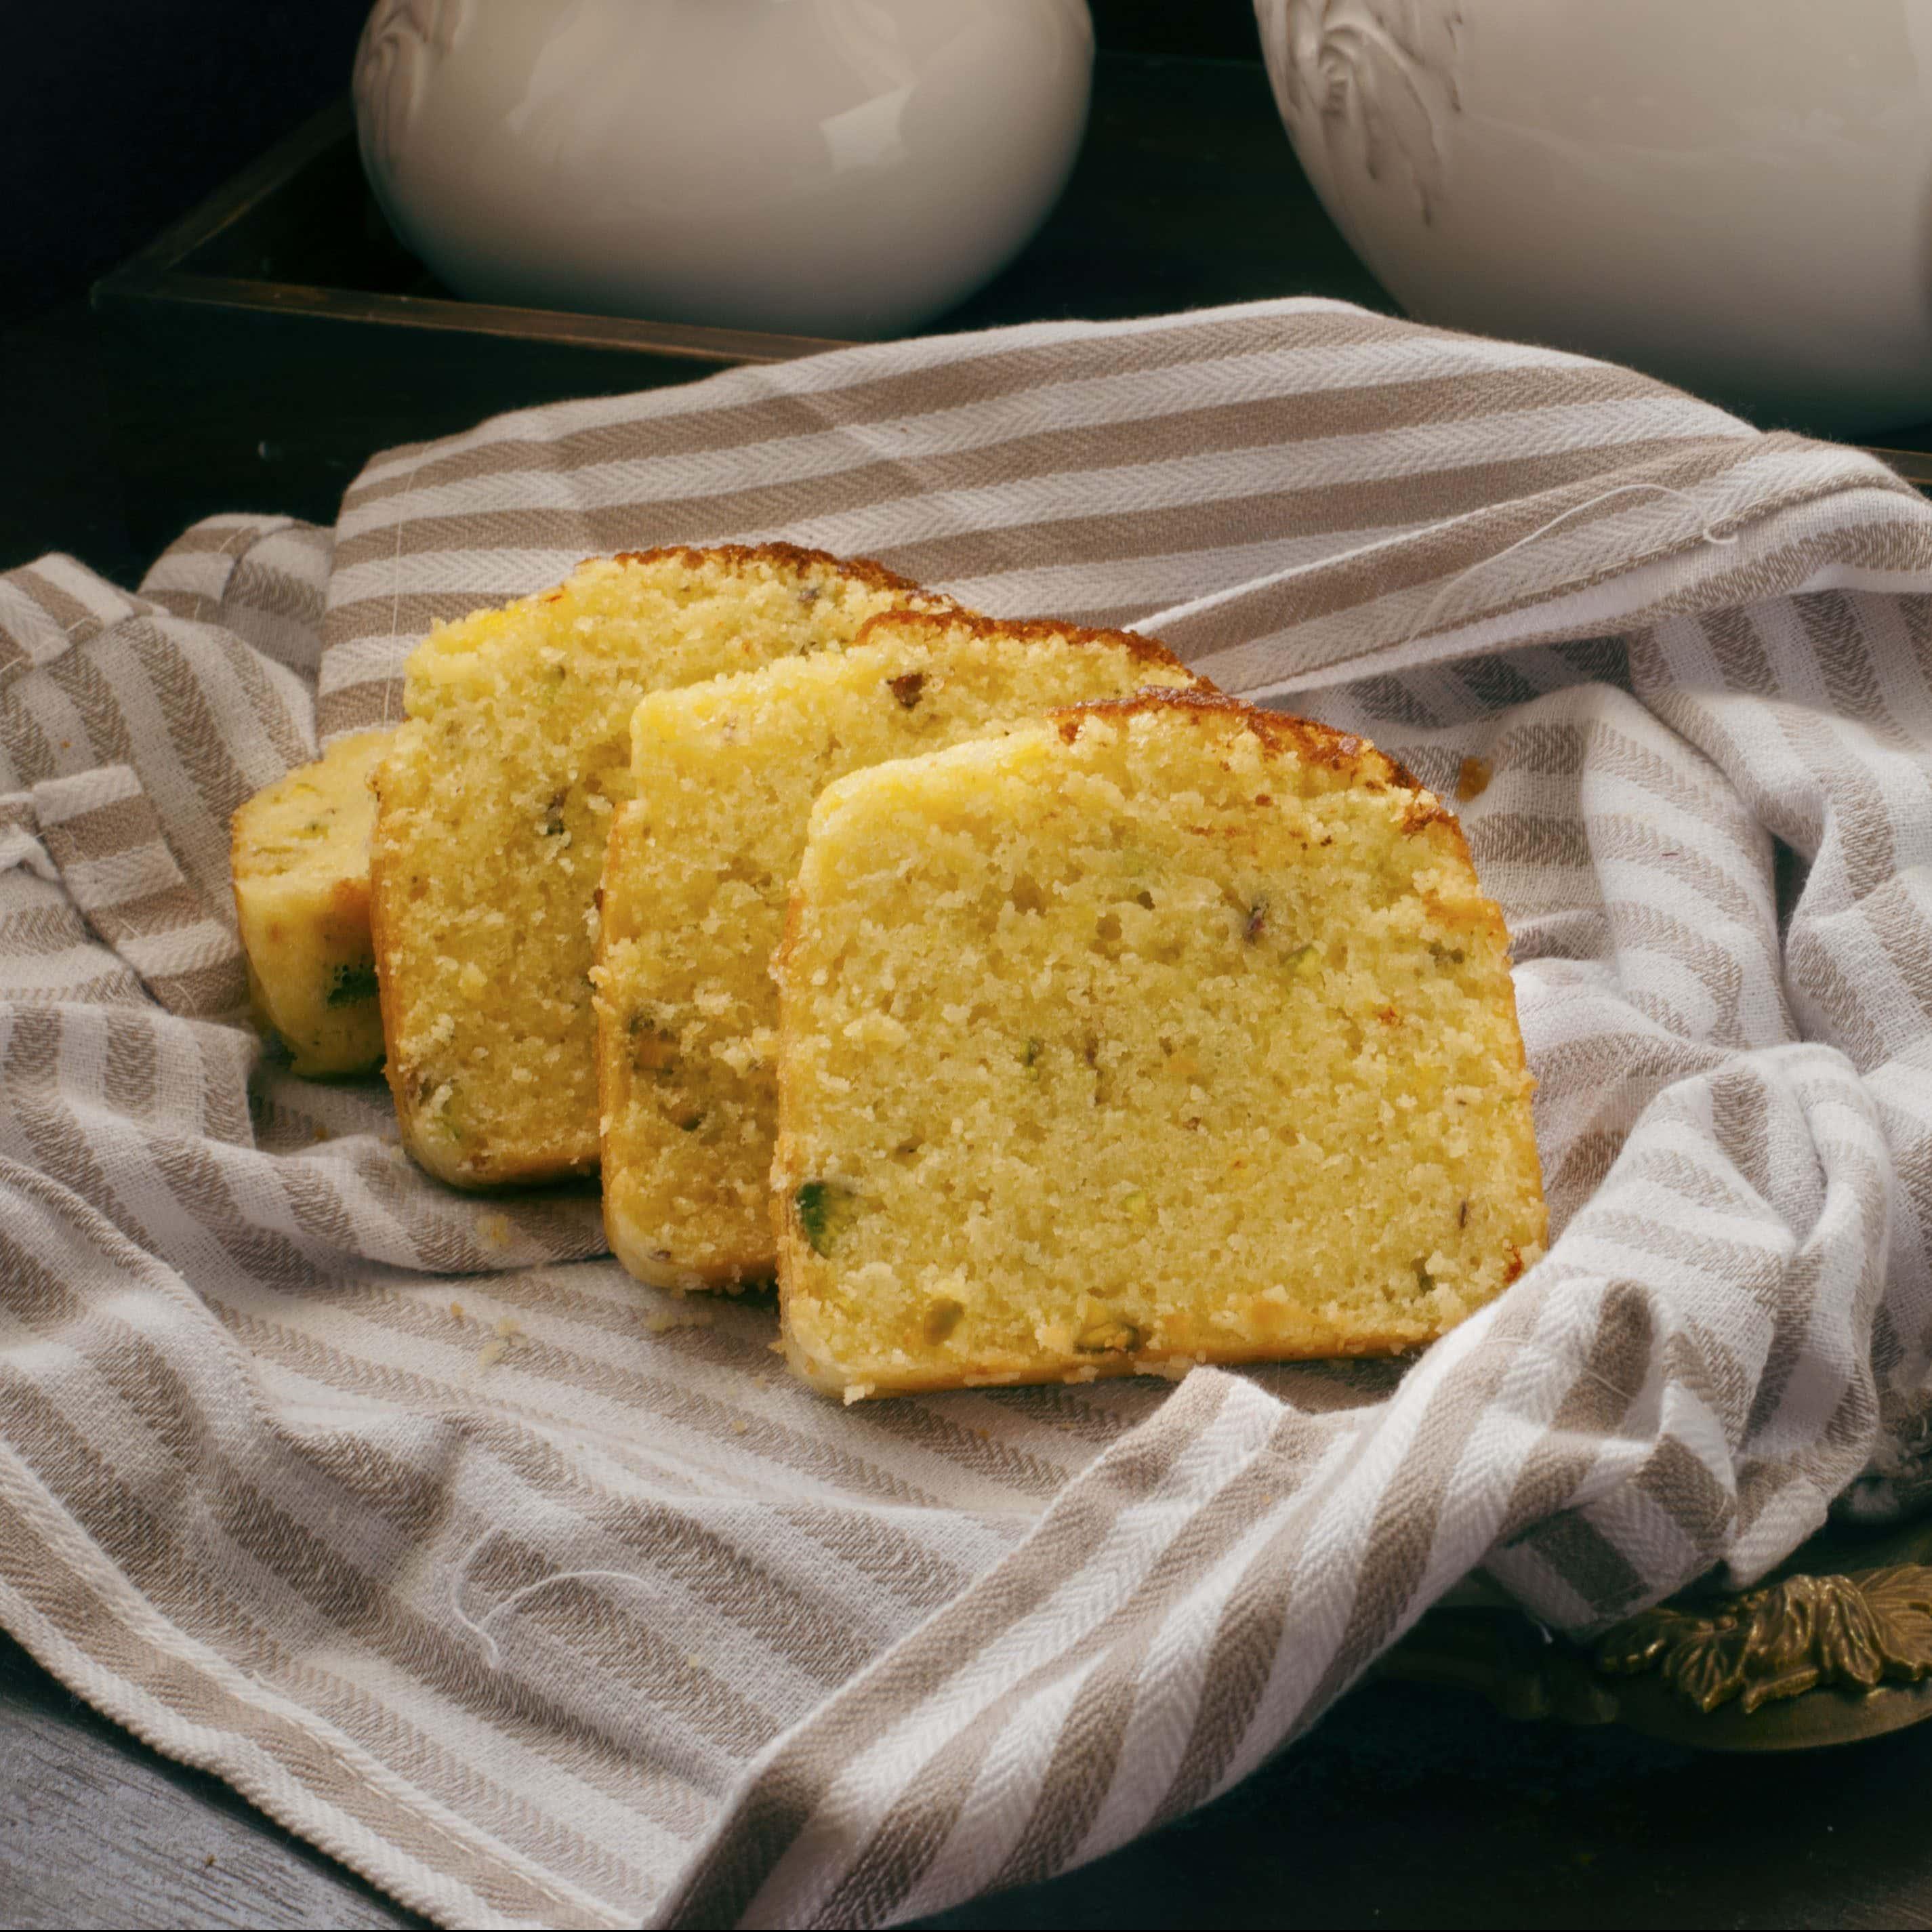 Hot Milk Cake with saffron and Pistachios